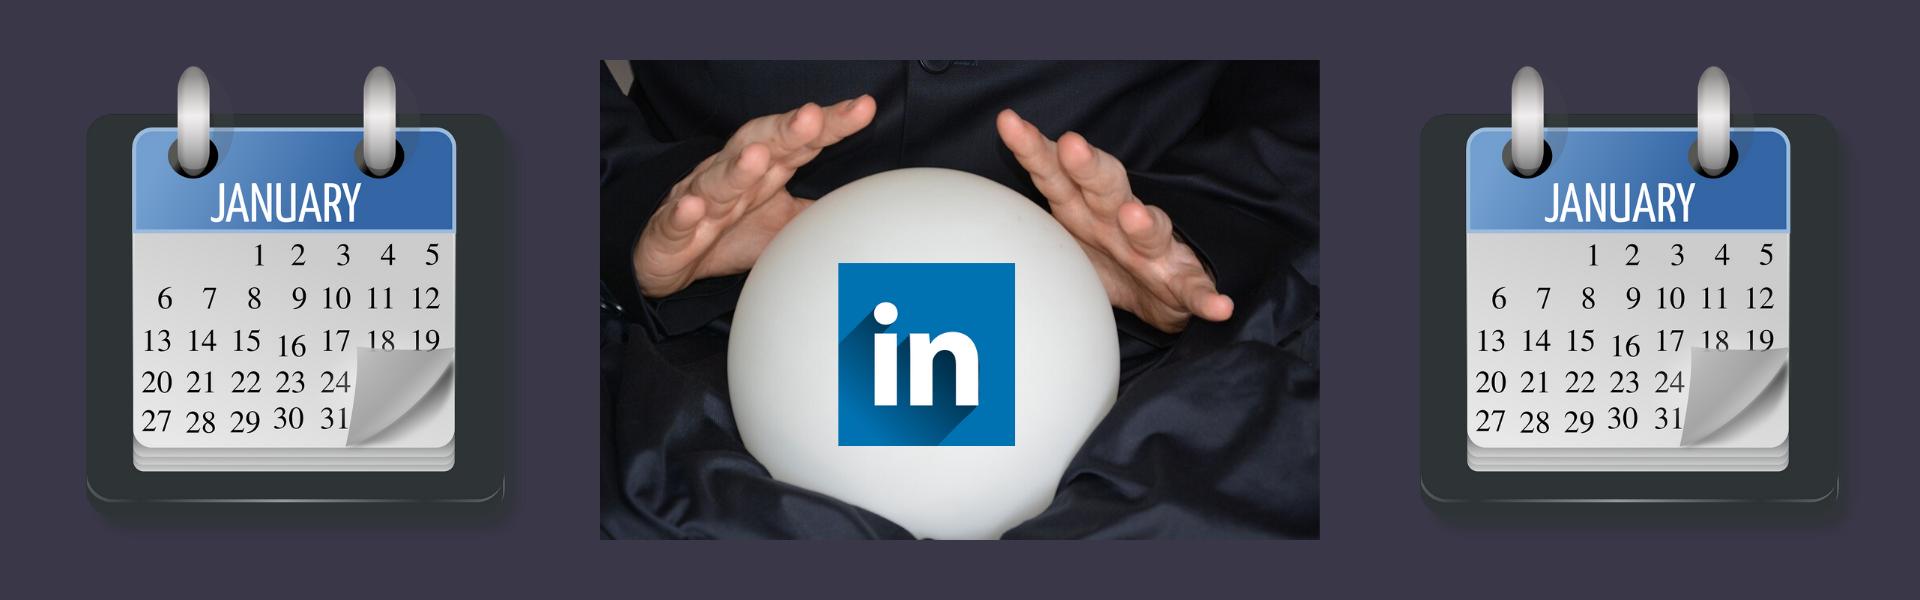 Digital Trends LinkedIn 2020